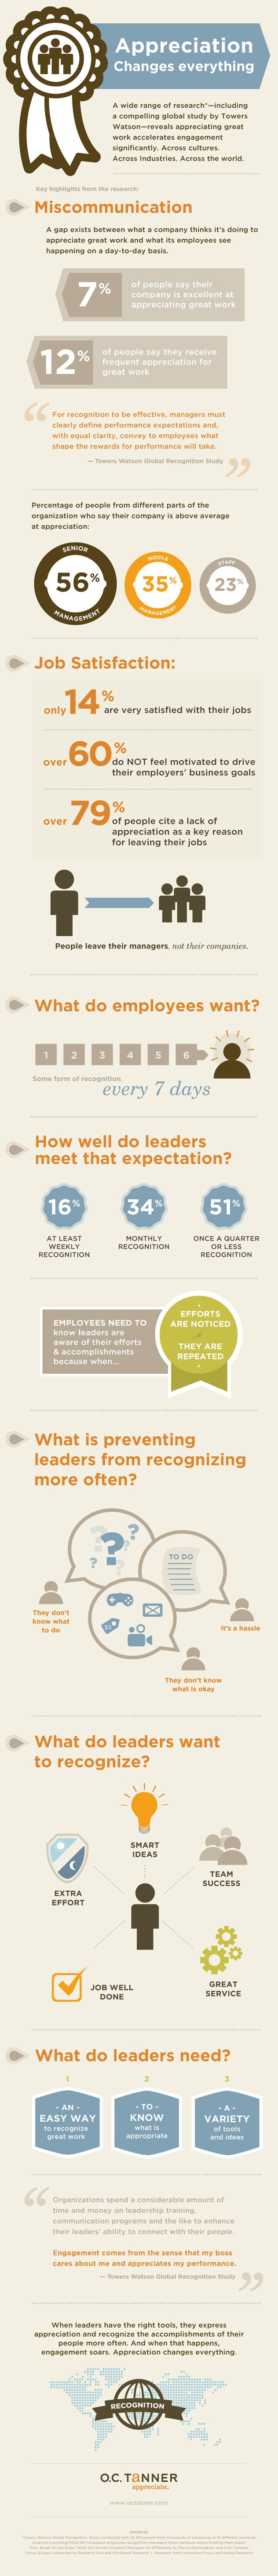 How to Show Employee Appreciation